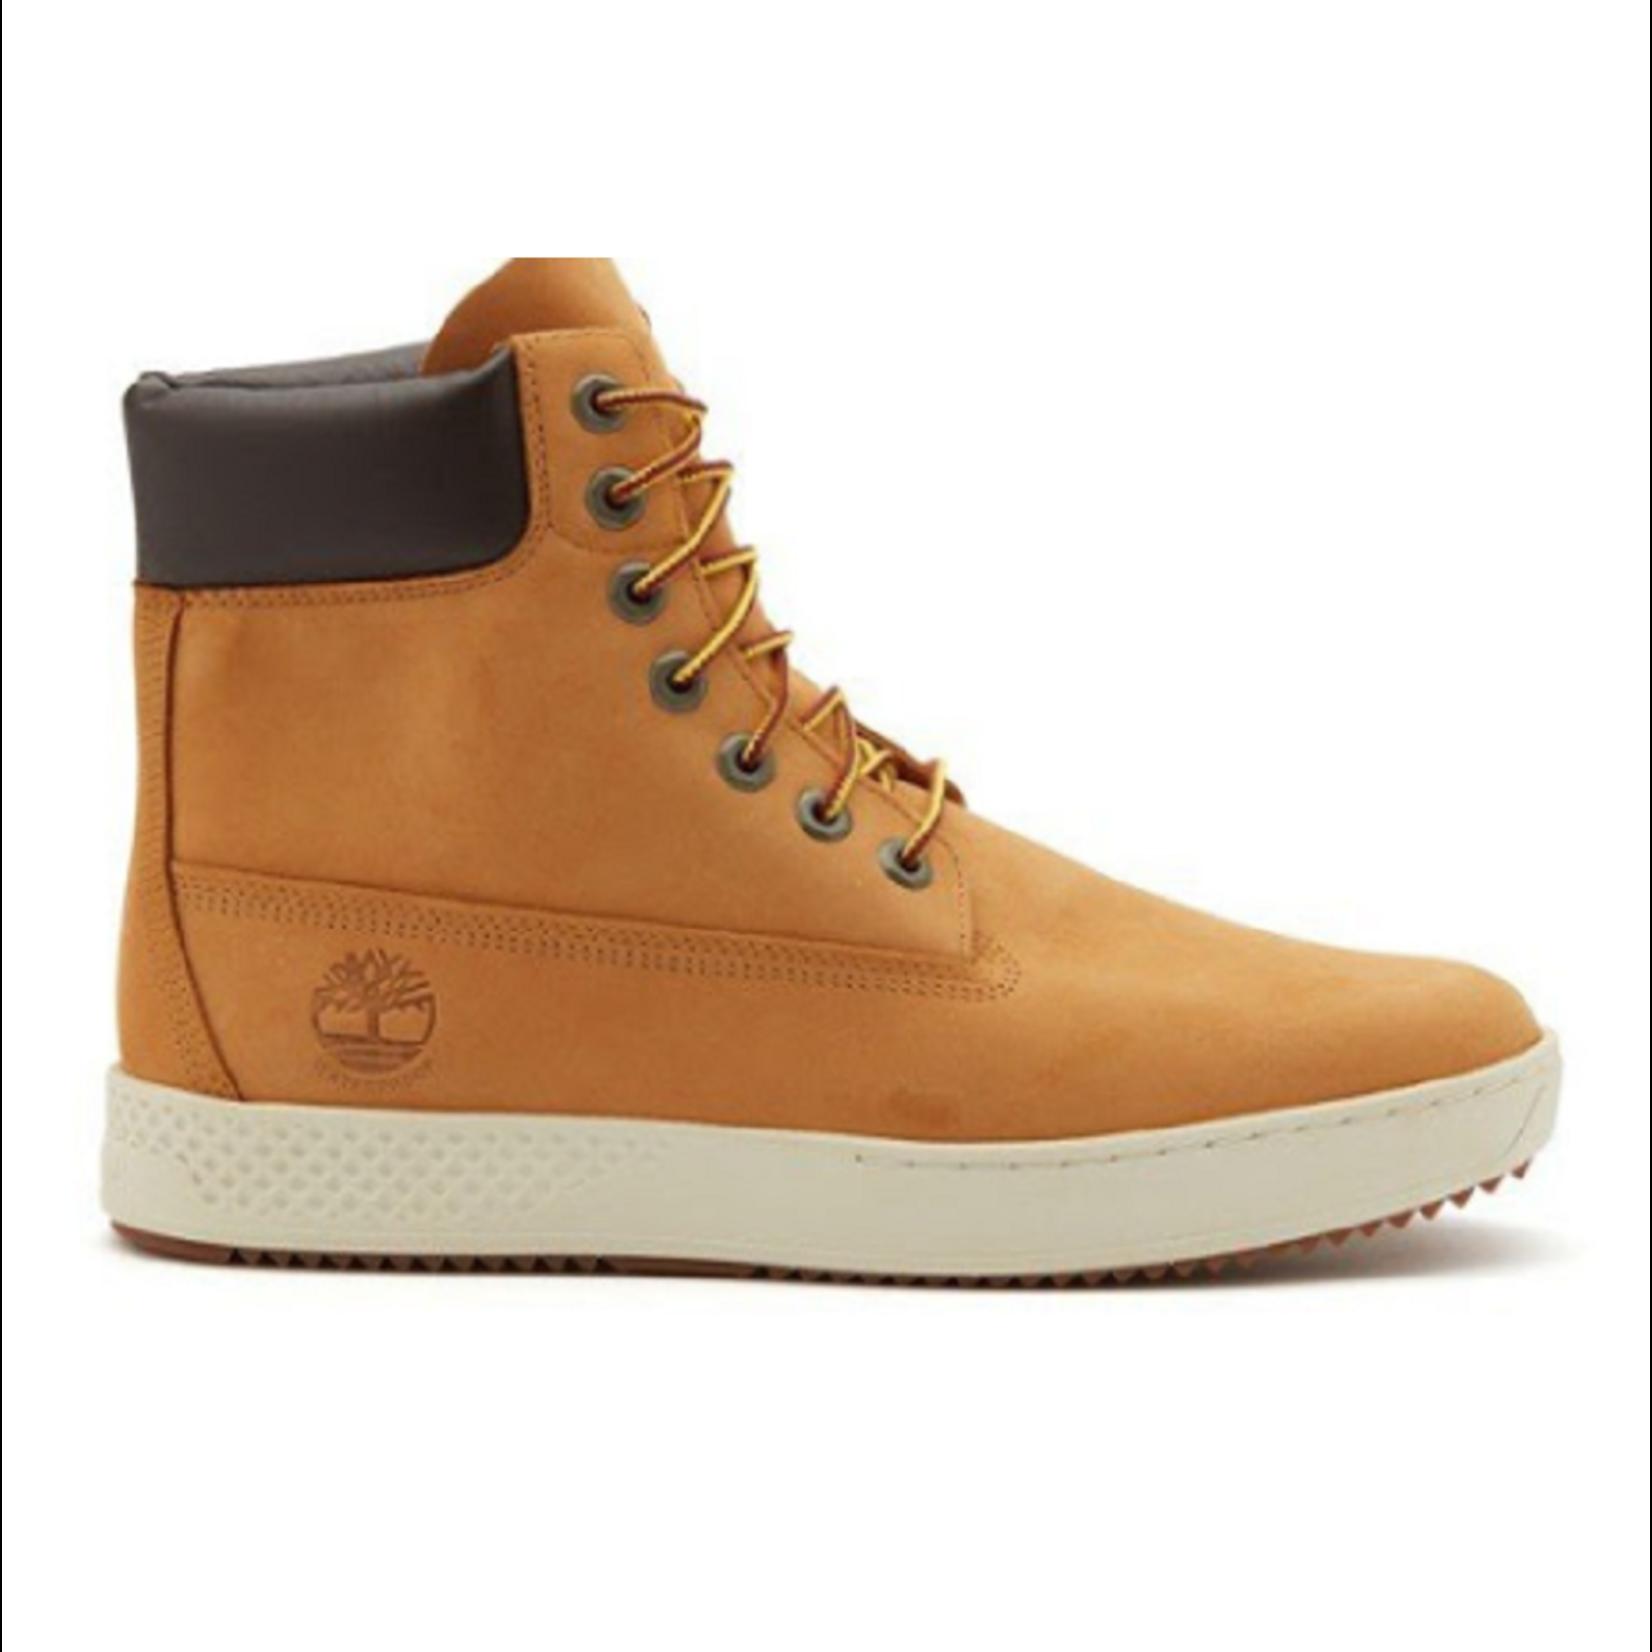 Timberland Cityroam 6 Inch Sneaker Boot Wheat